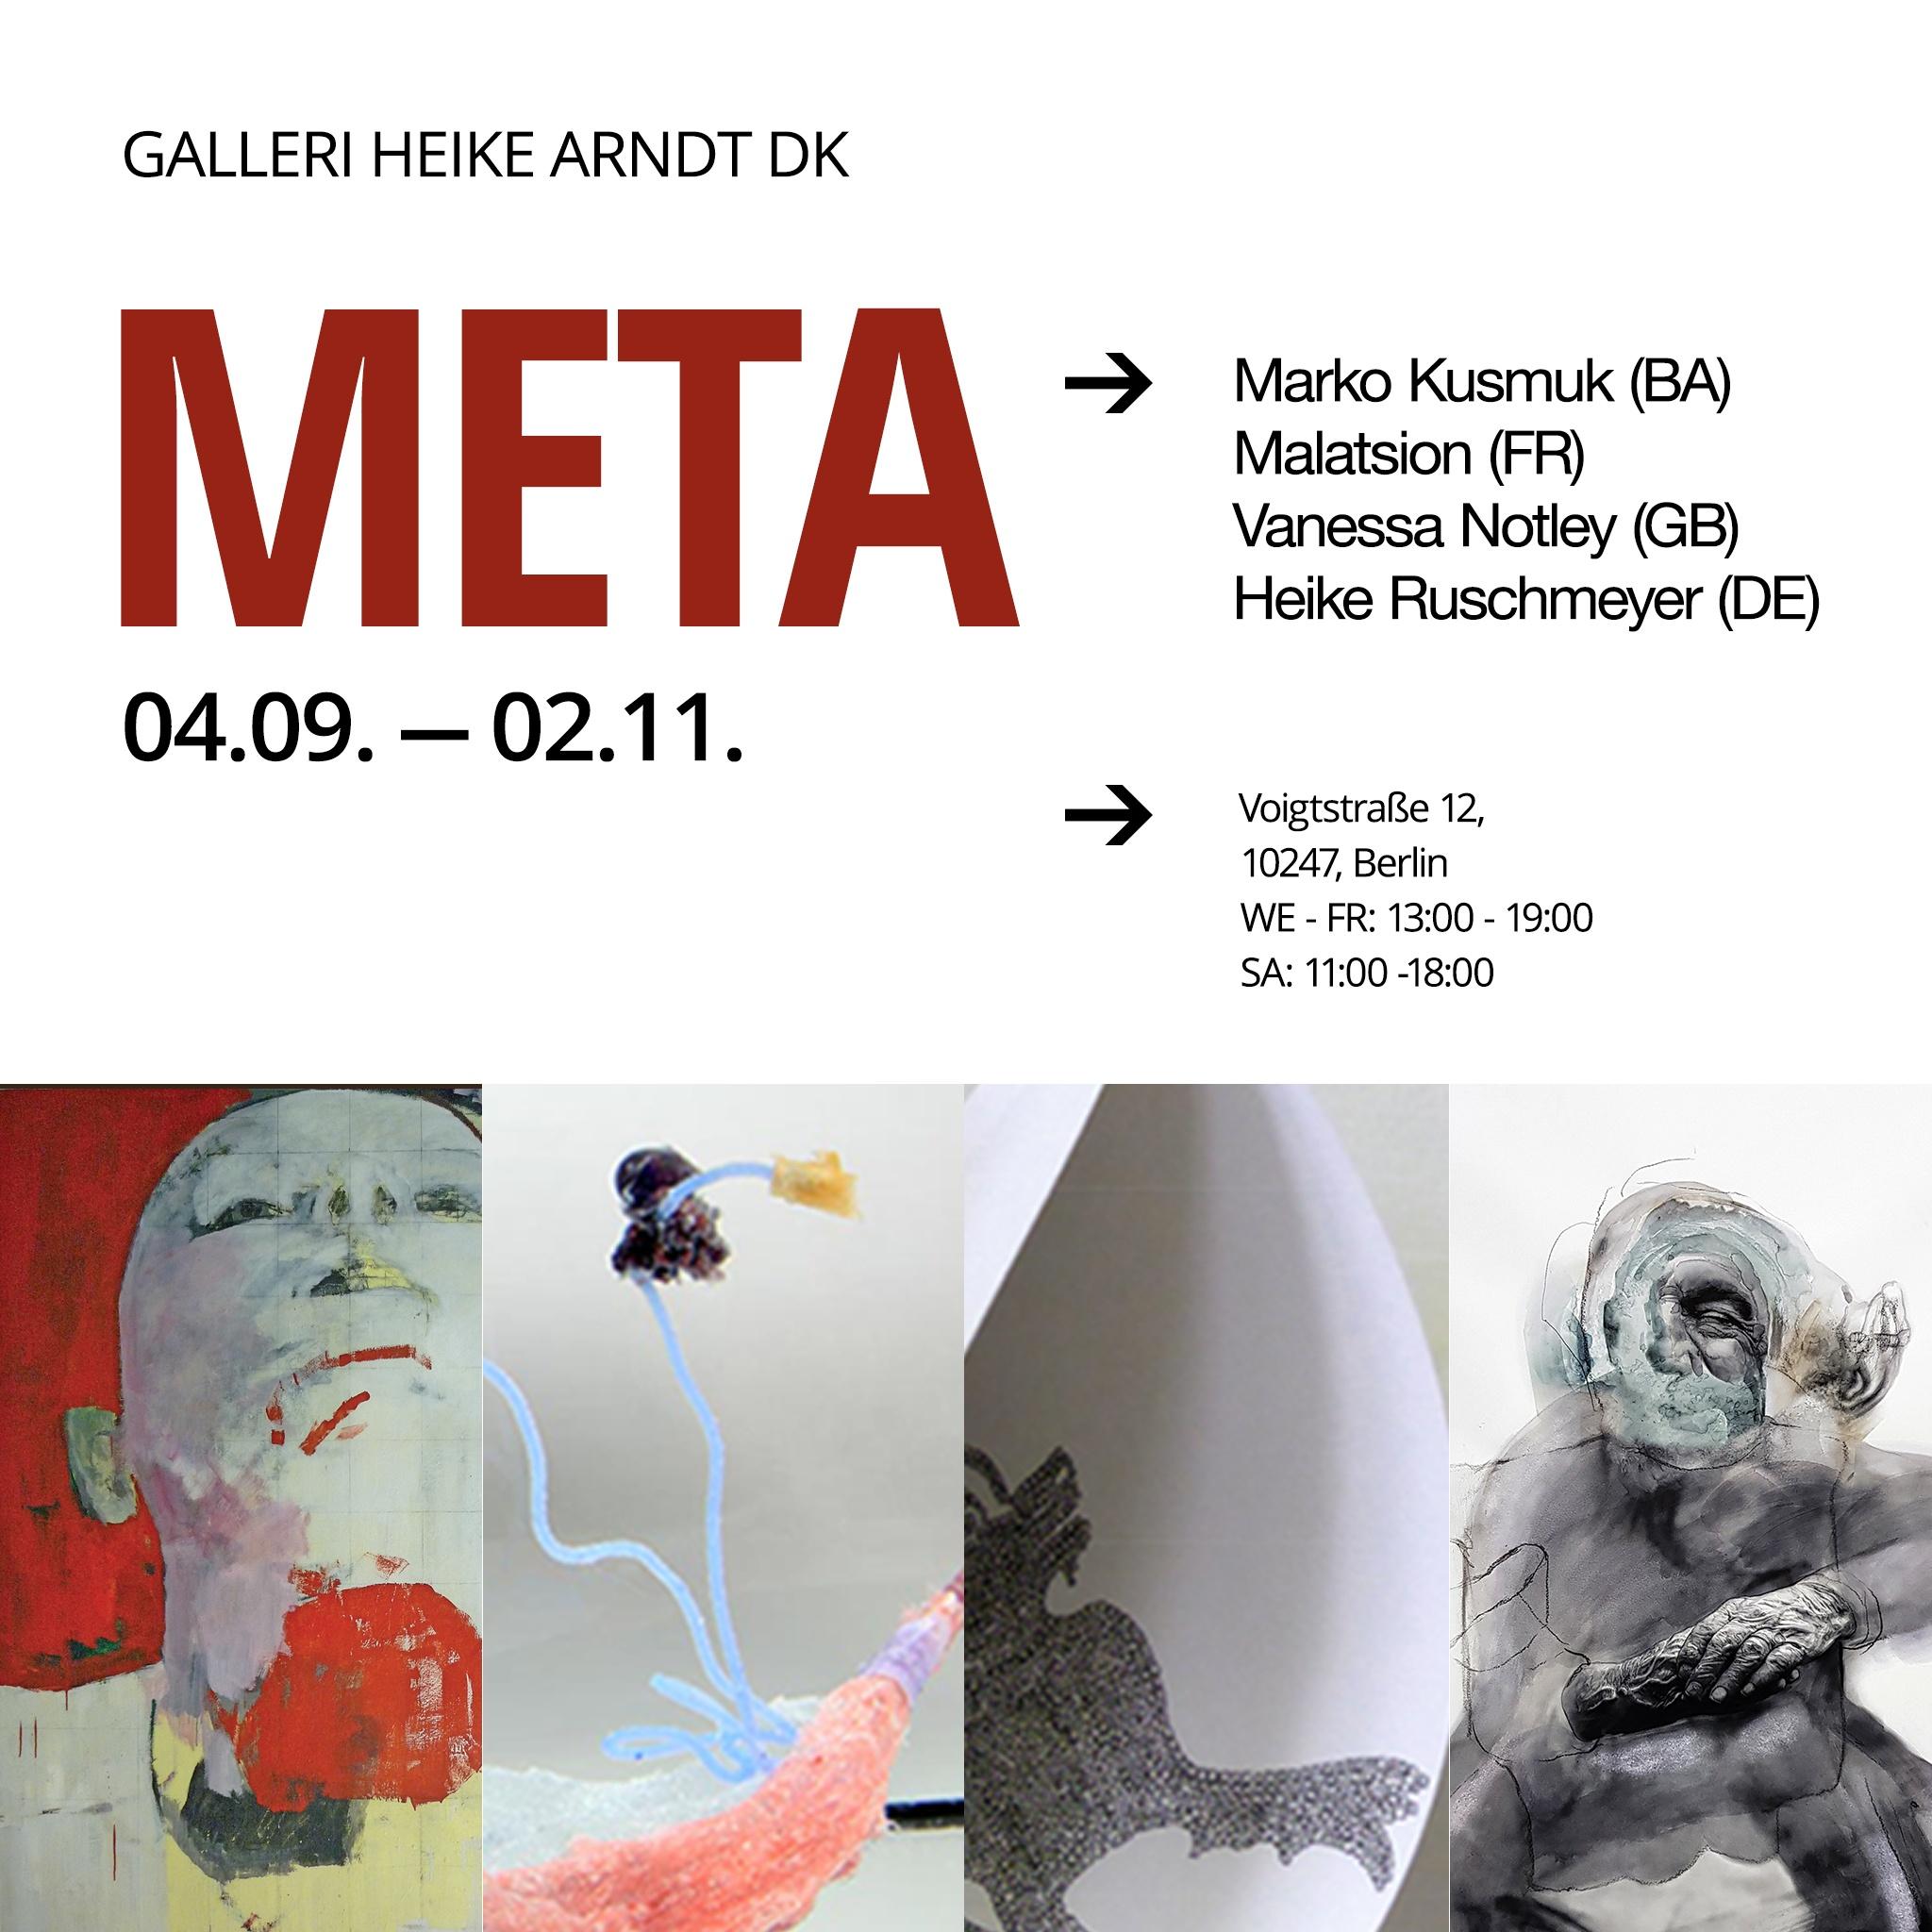 Galleri Heike Arndt DK